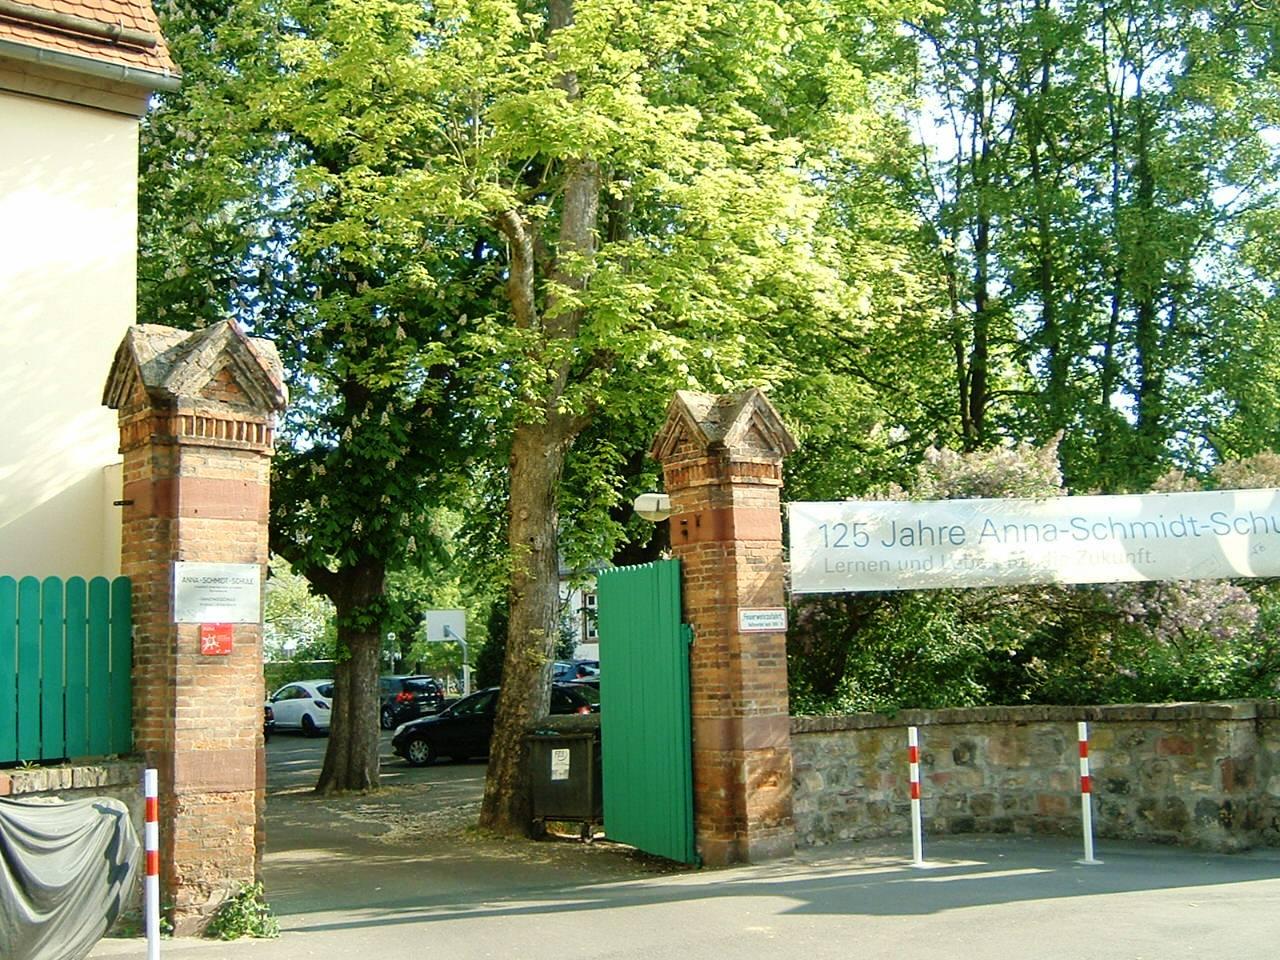 Dateianna Schmidt Schule Niedererlenbach P 011jpg Wikipedia